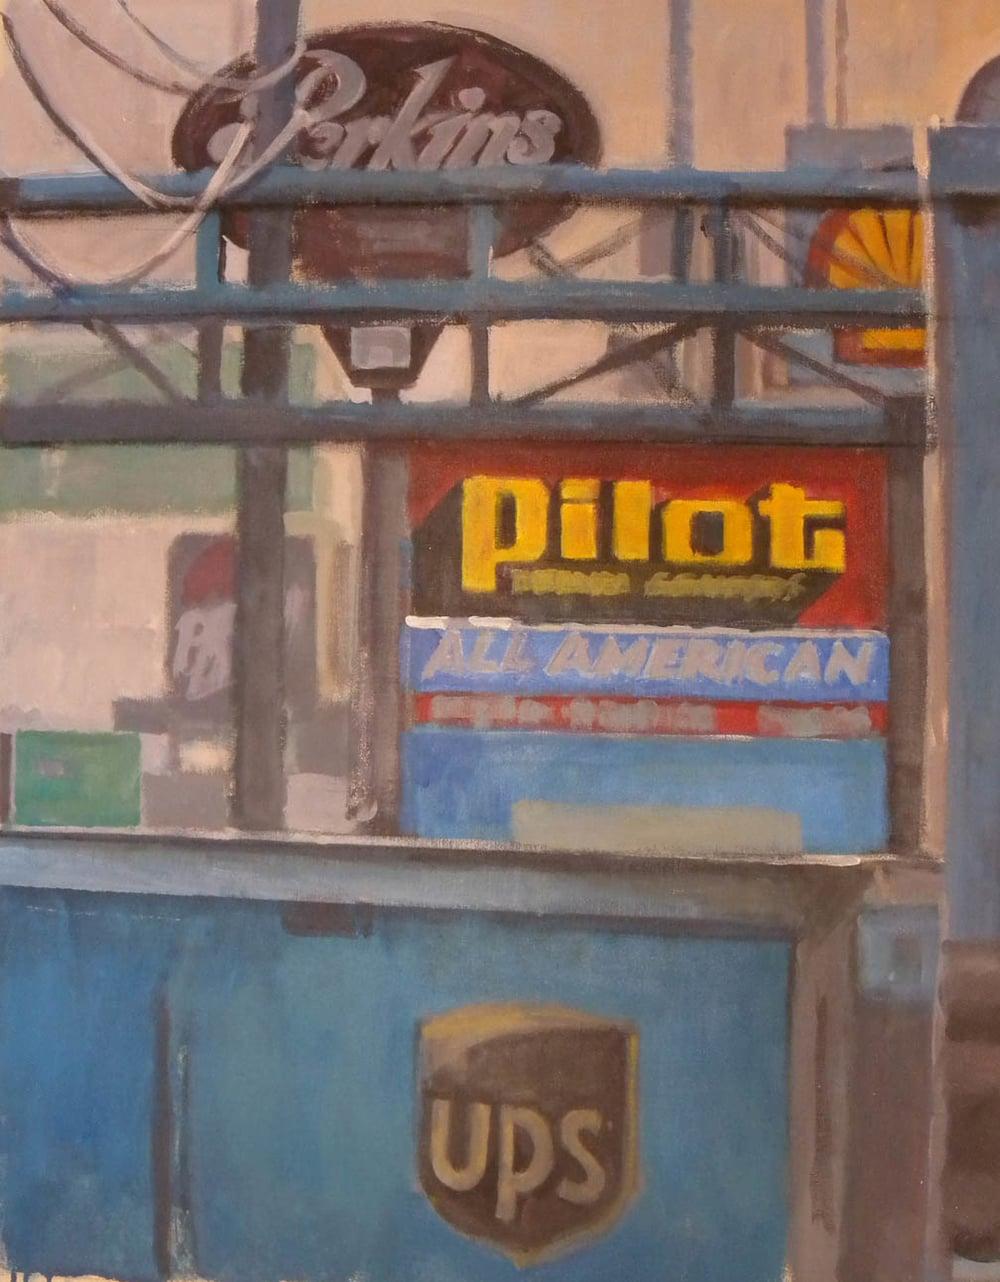 "Pilot All American,acrylic on canvas,37"" x 29 1/2"" On Exhibit, Addison/Ripley Fine Art, DC"